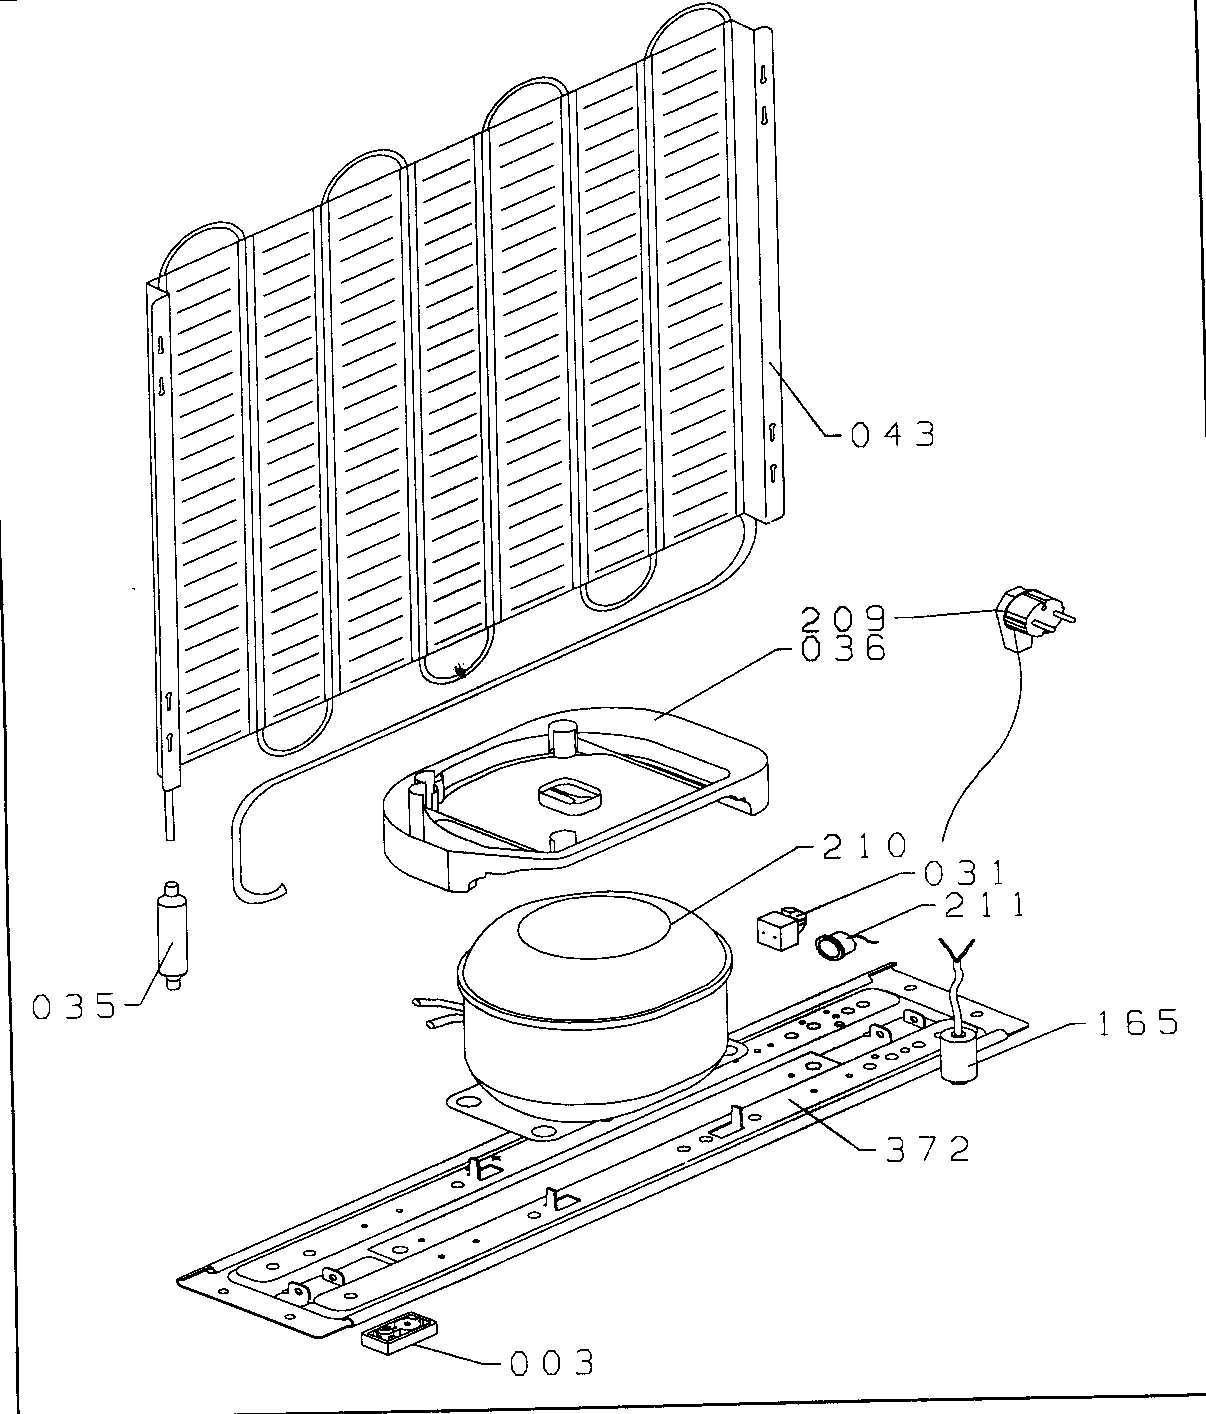 Danby model D1012W all refrigerator genuine parts